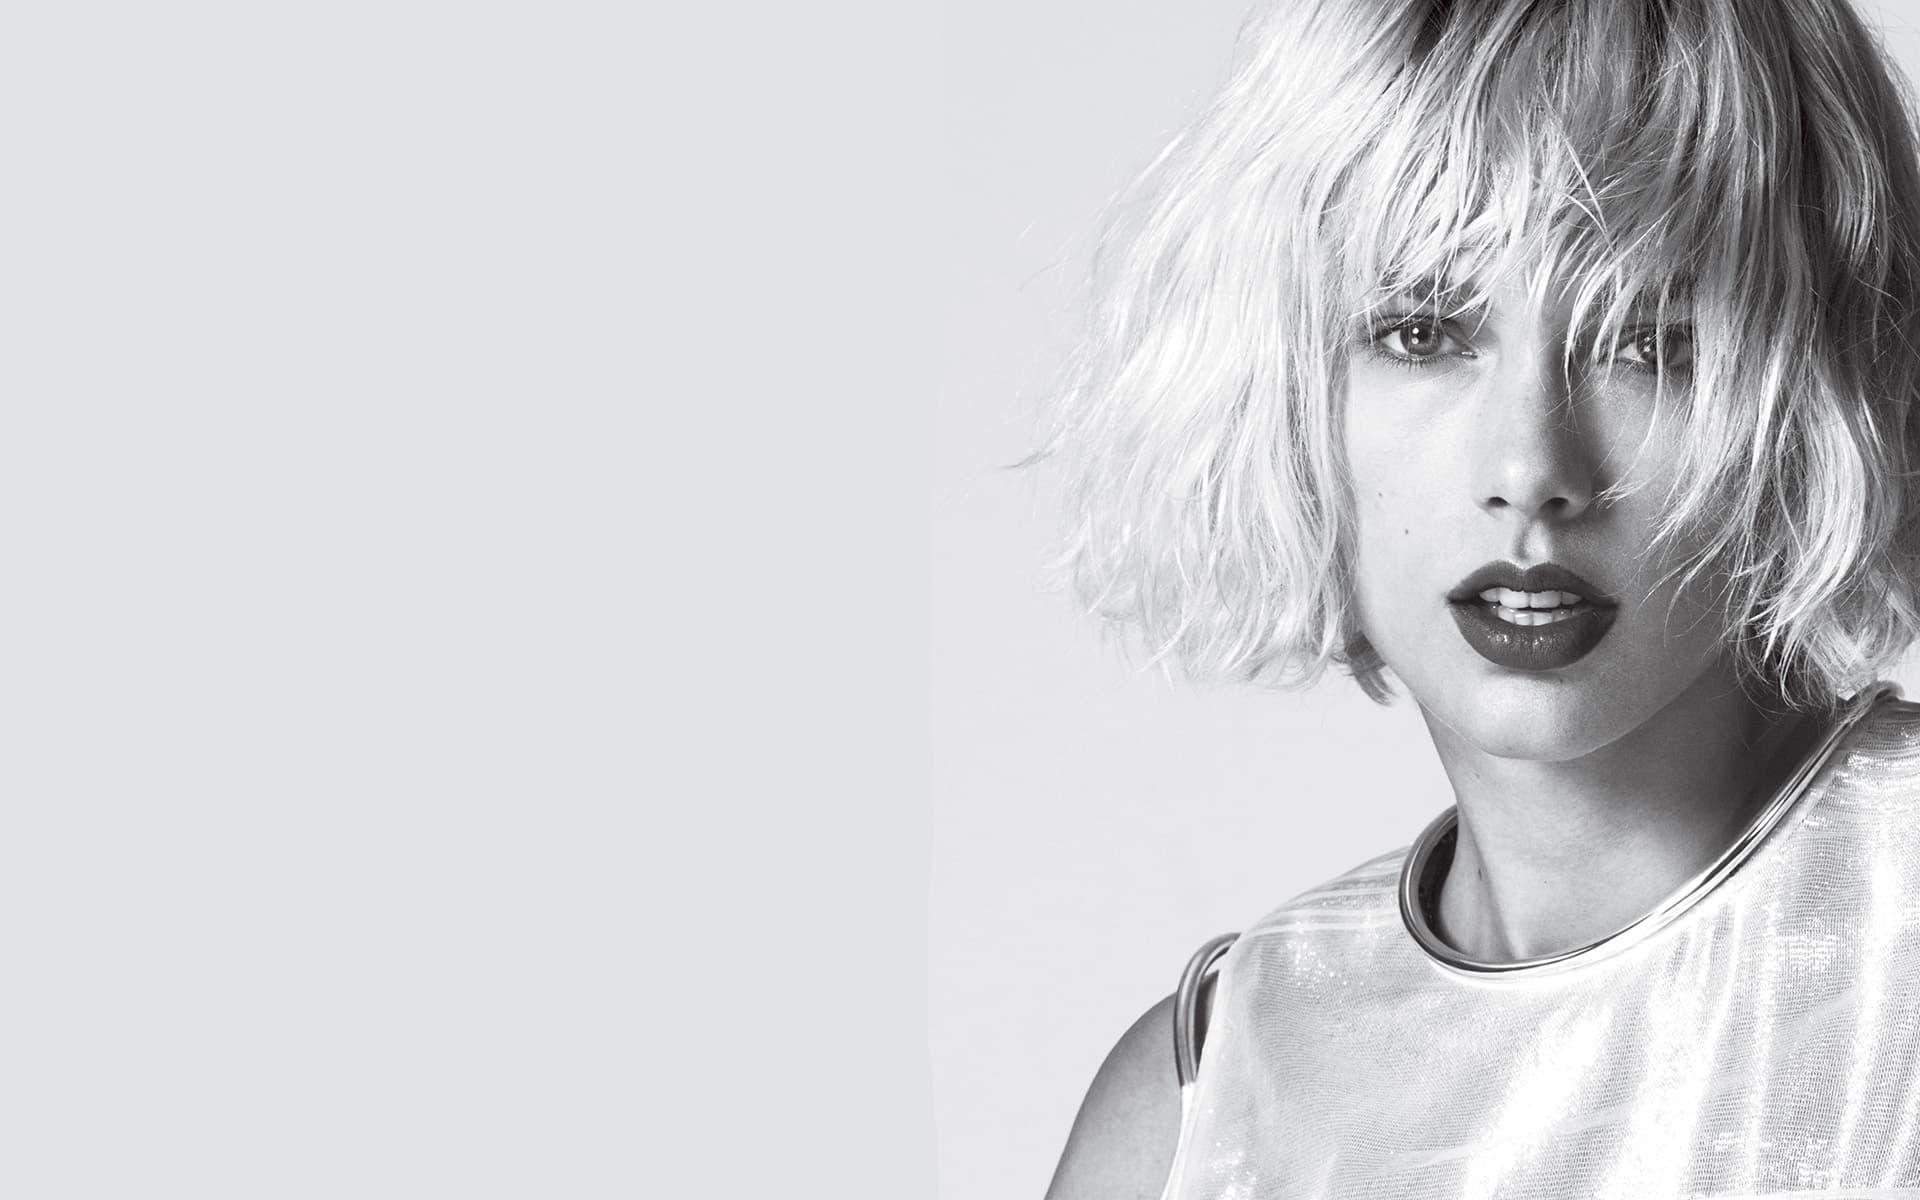 Download Taylor Swift Short Hair Wallpaper 66446 1920x1200